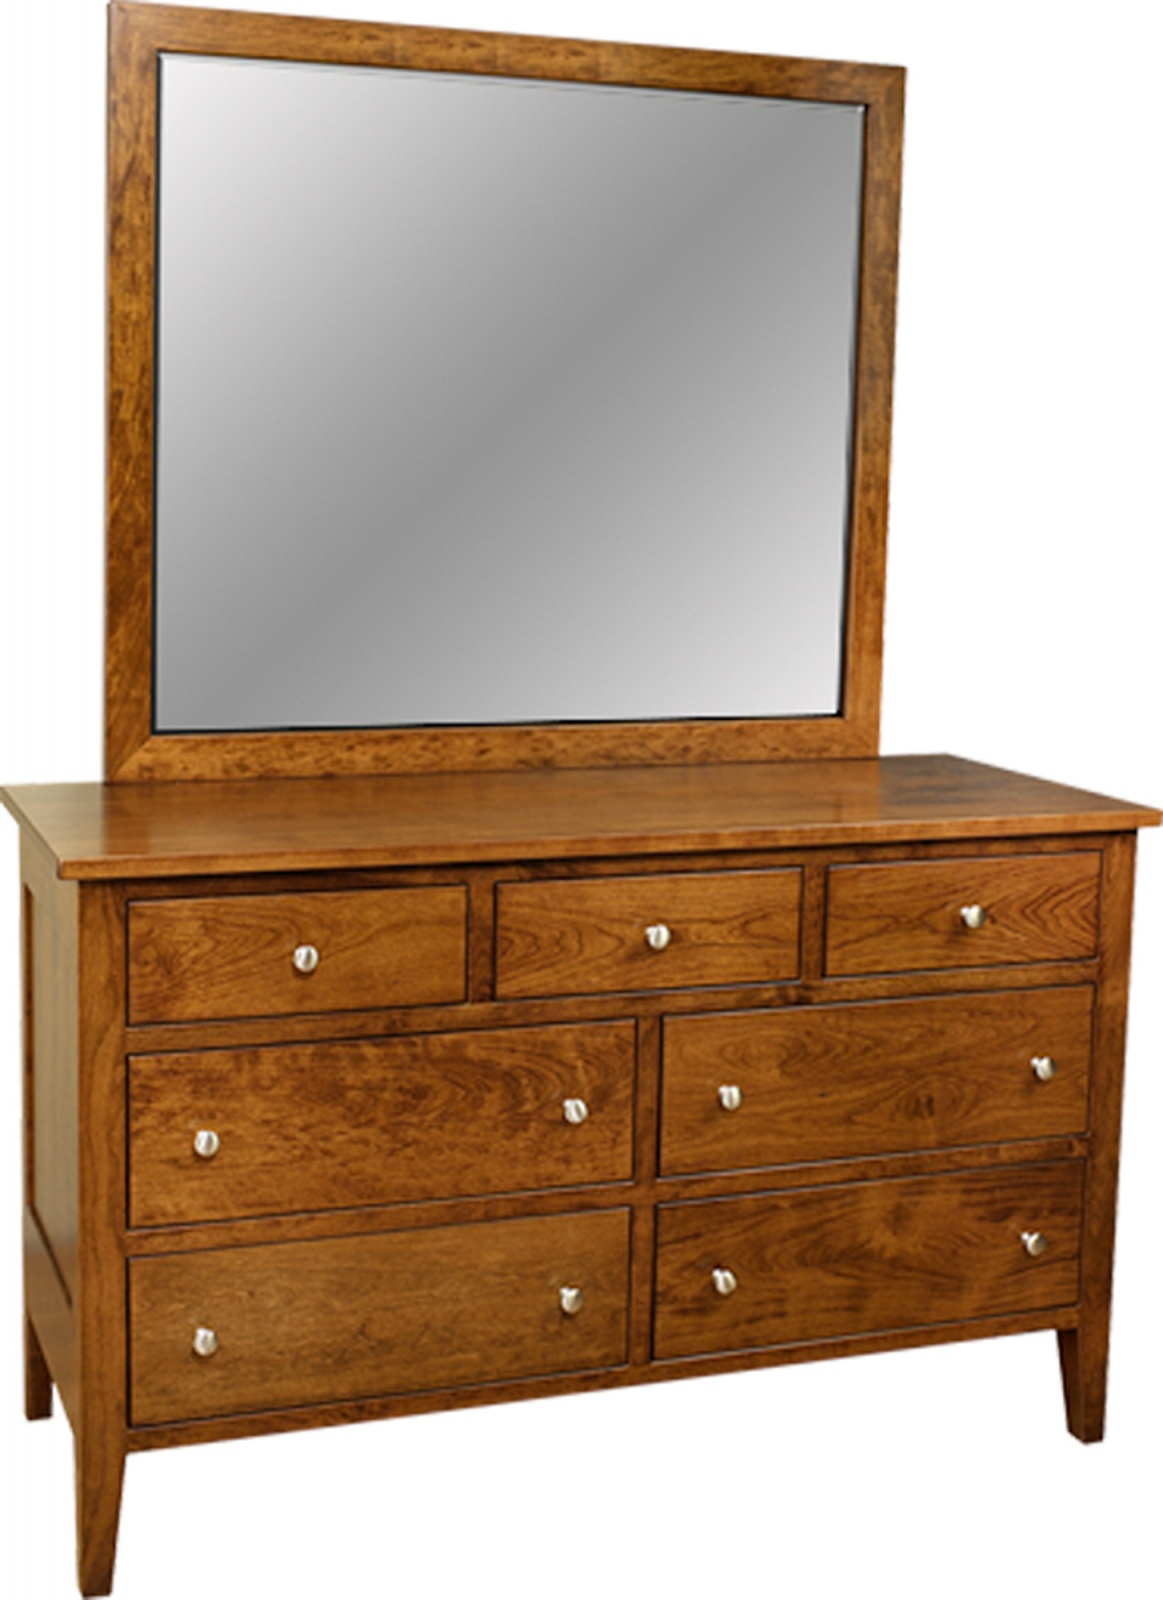 CS-1655 Dresser MI-516 Mirror.jpg